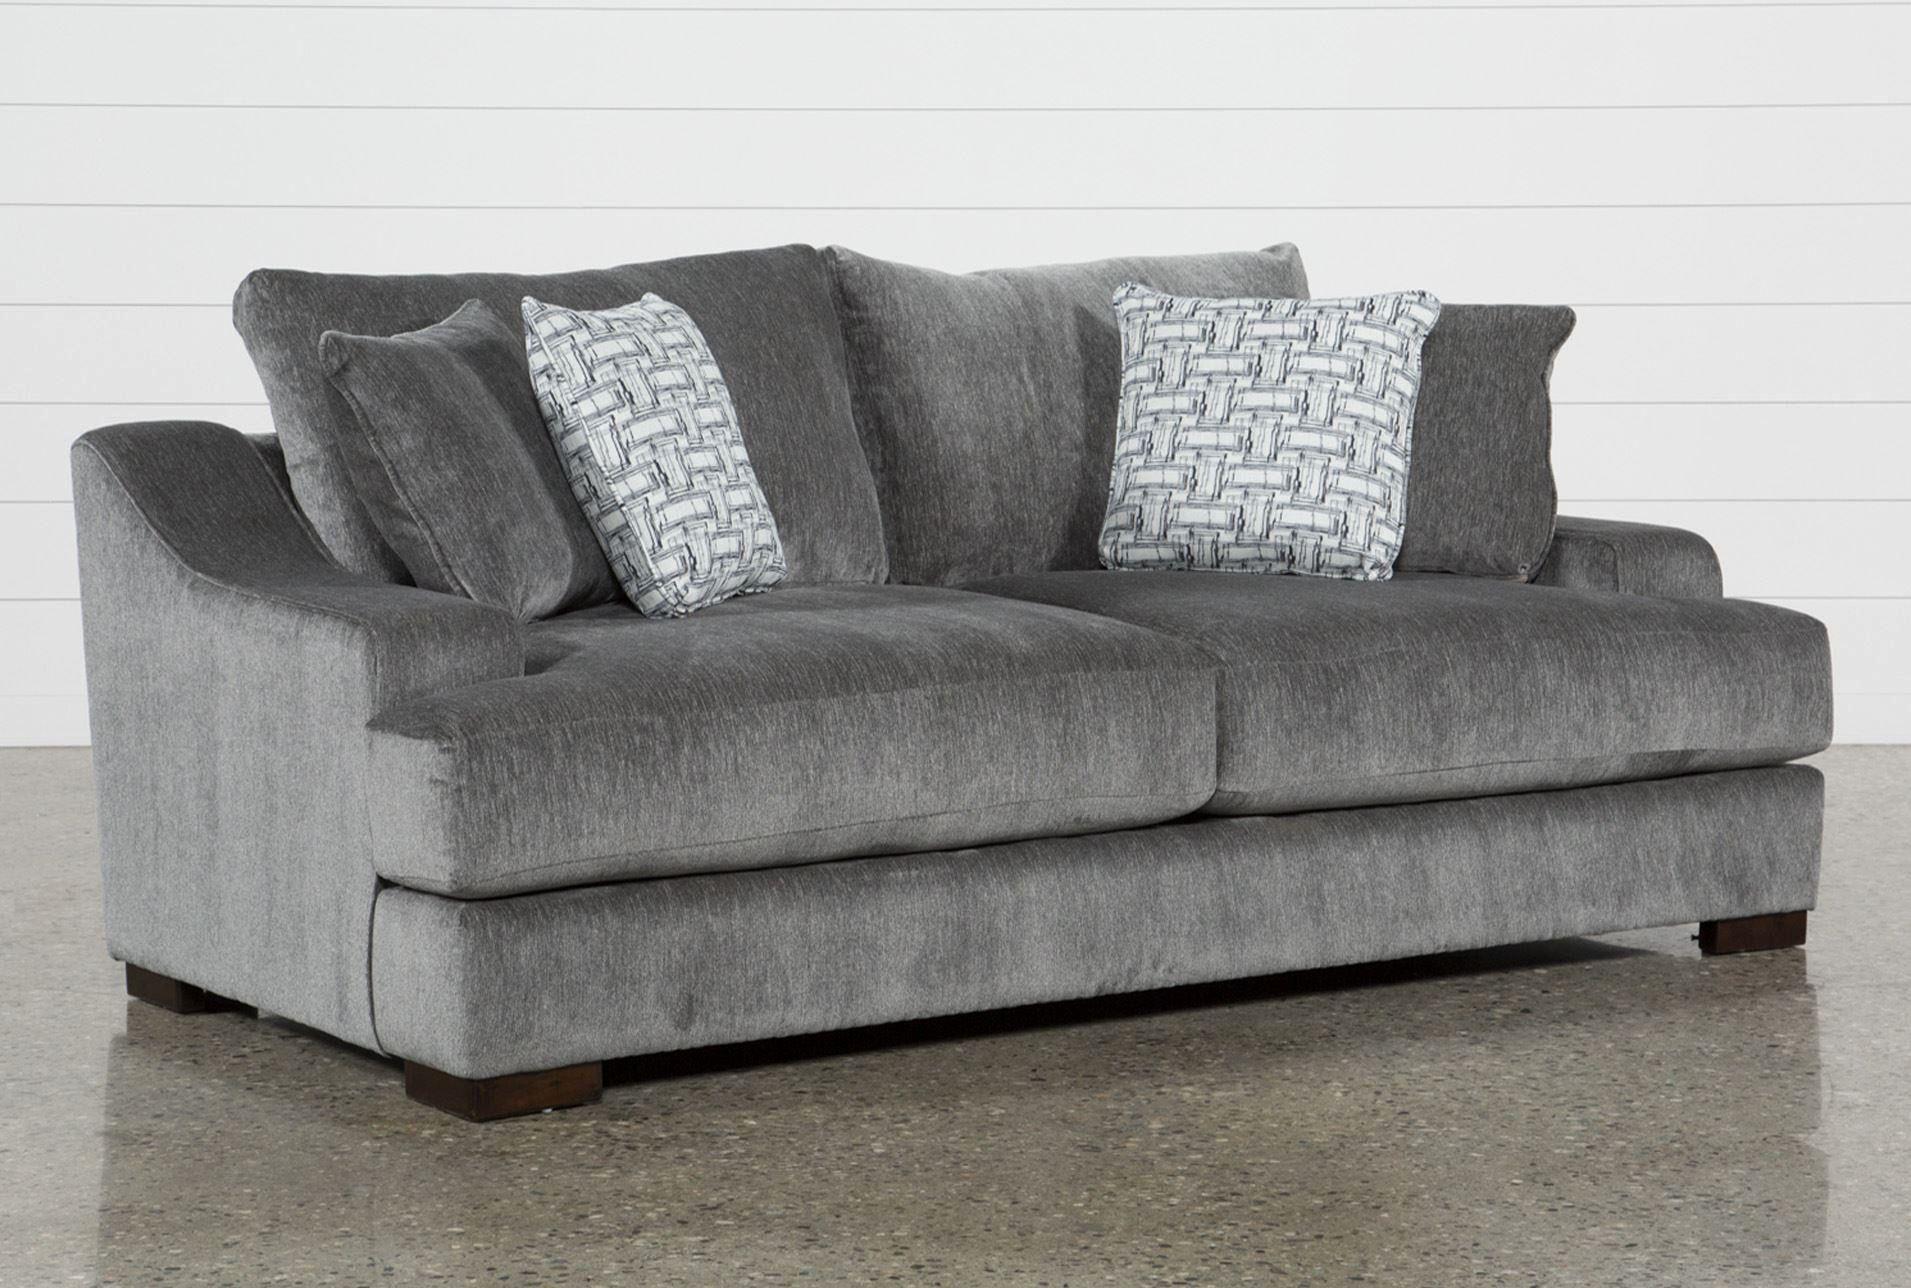 Best Of Living Spaces Sleeper Sofa Shot Living Spaces Sleeper Sofa